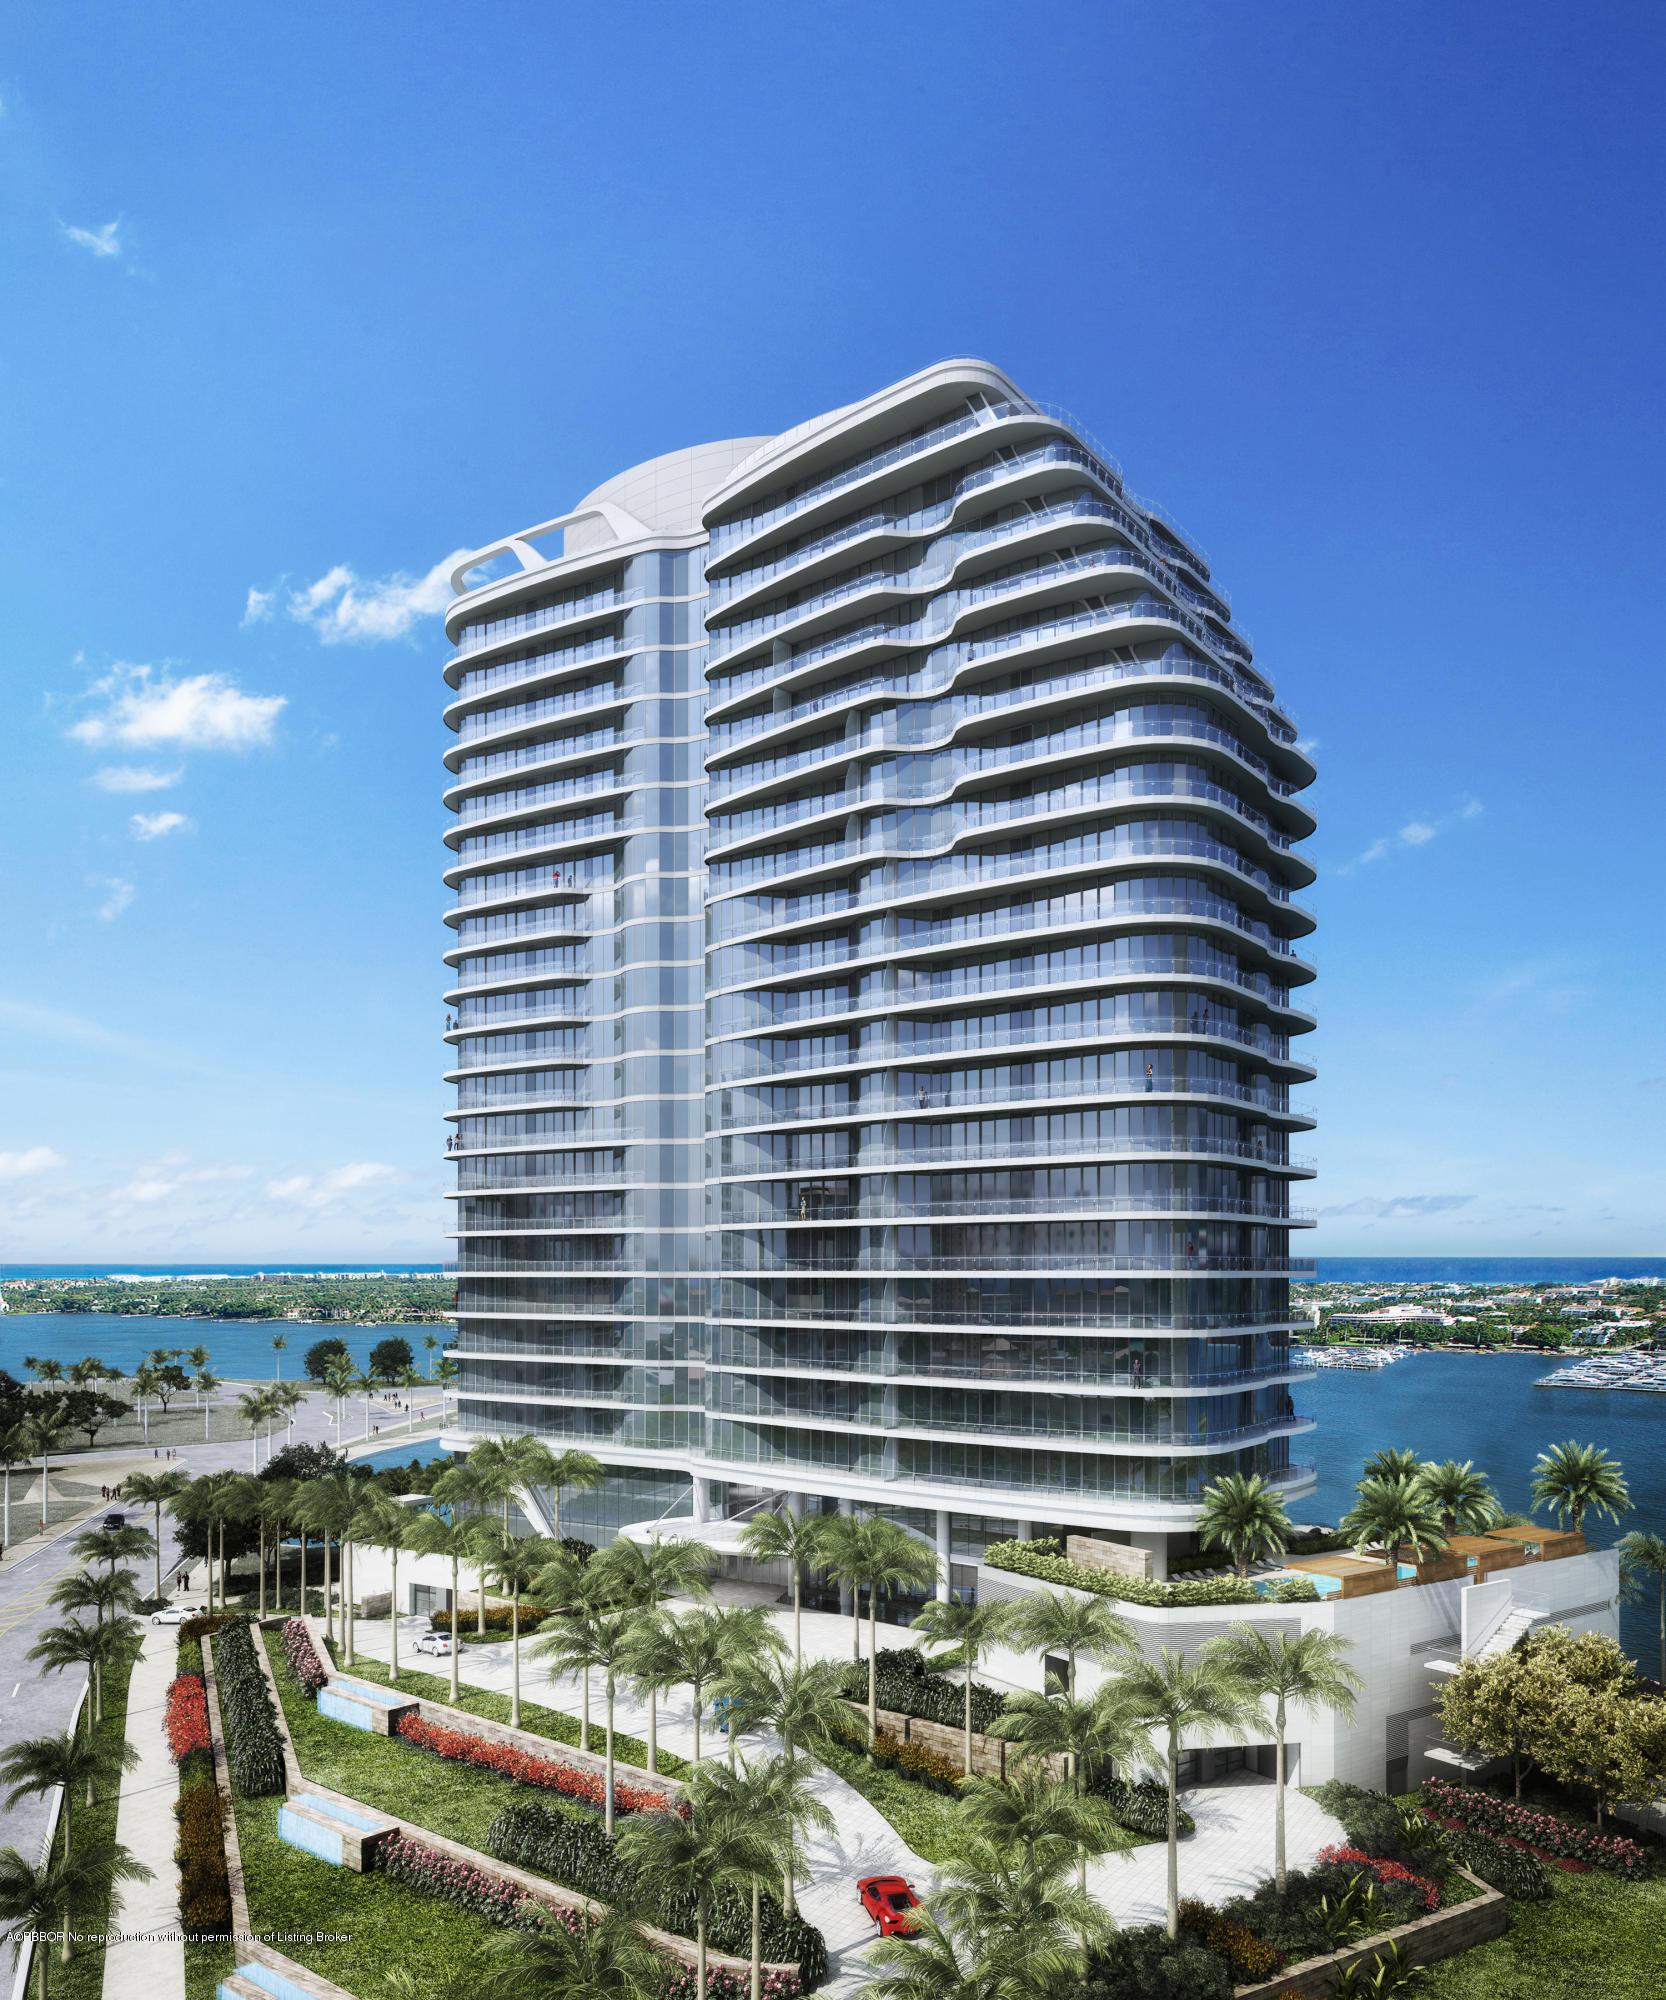 1100 S Flagler Drive West Palm Beach, FL 33401